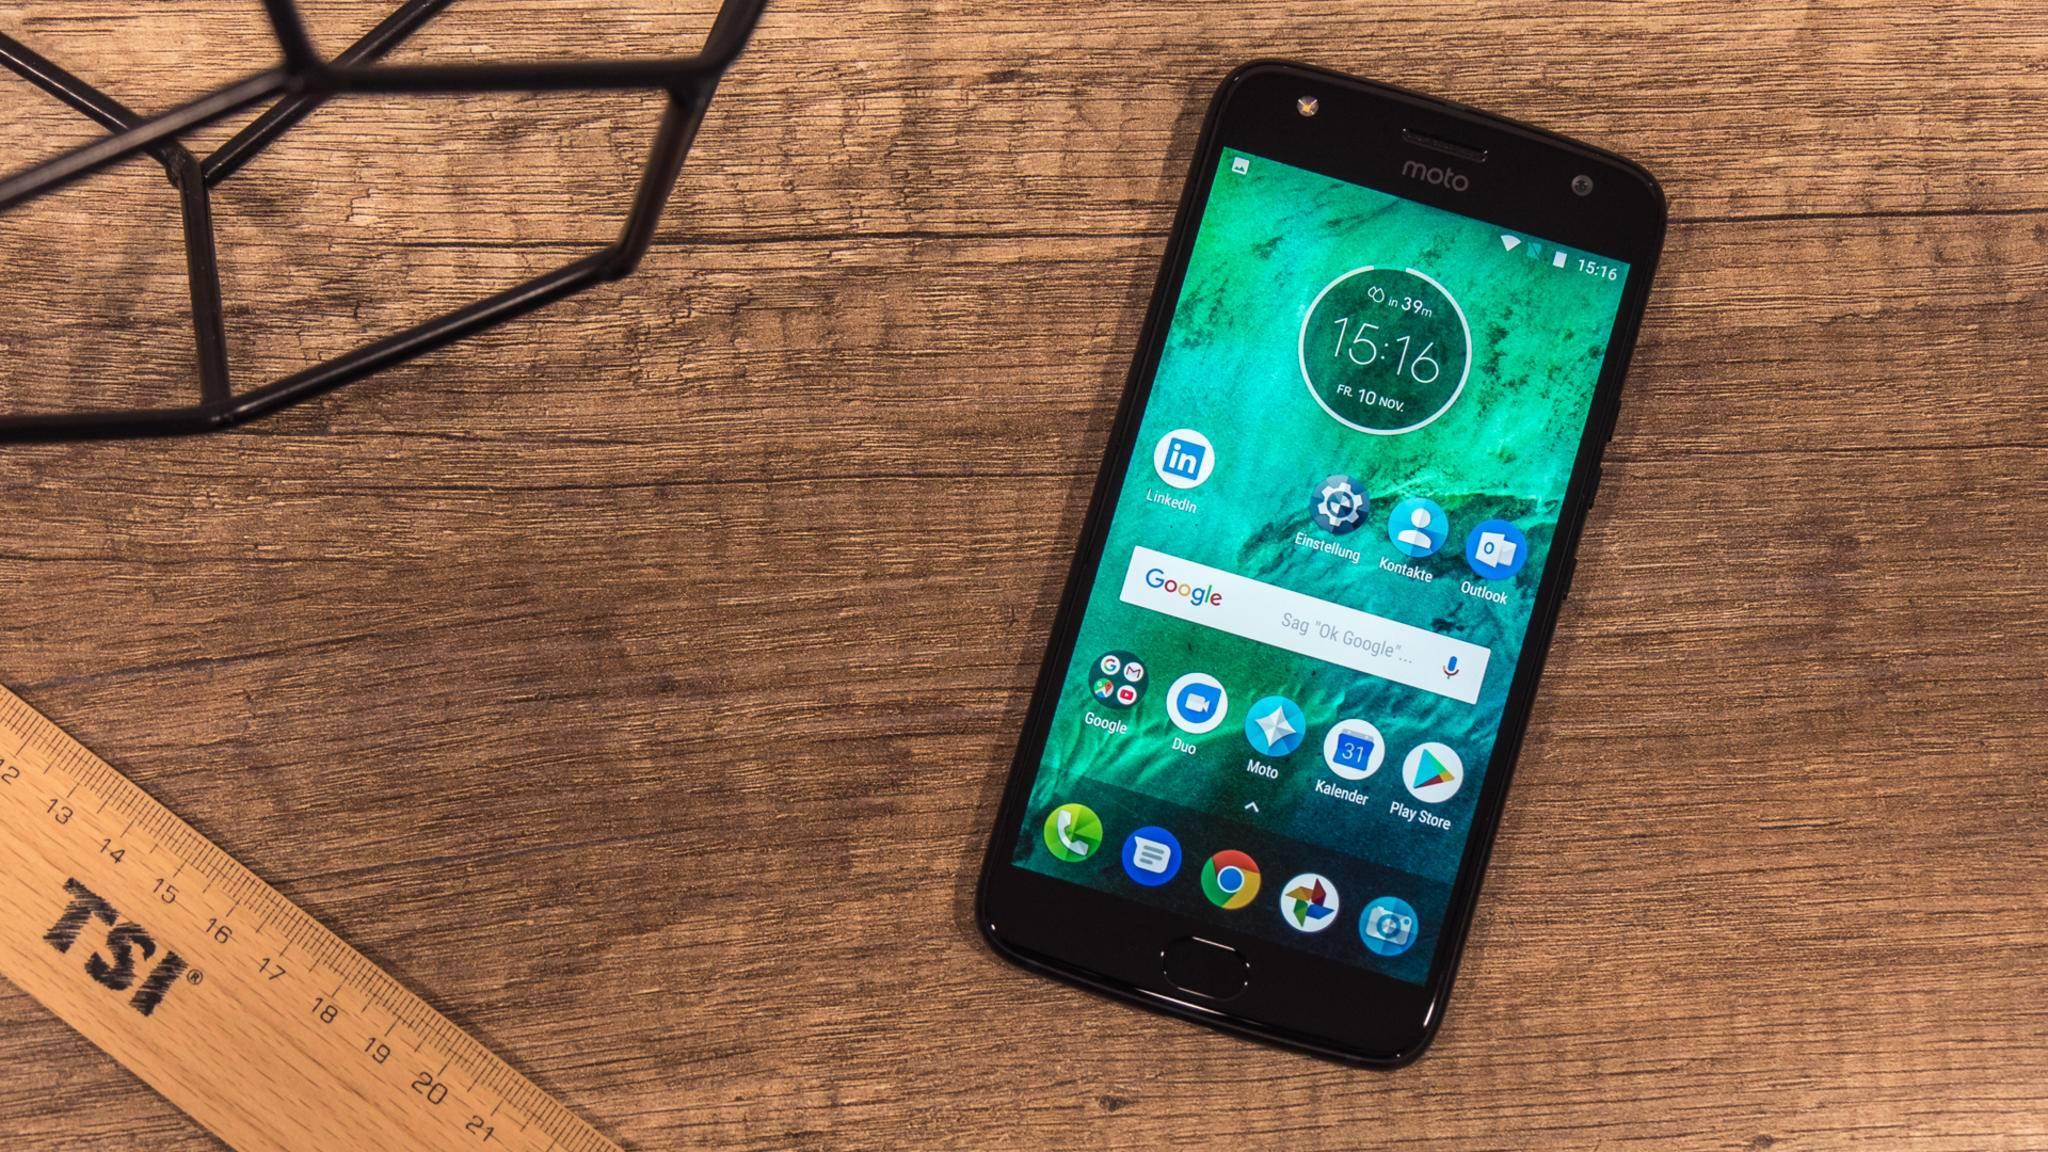 Mittelklasse-Smartphones wie das Motorola Moto X4 lassen sich bereits flüssig bedienen.